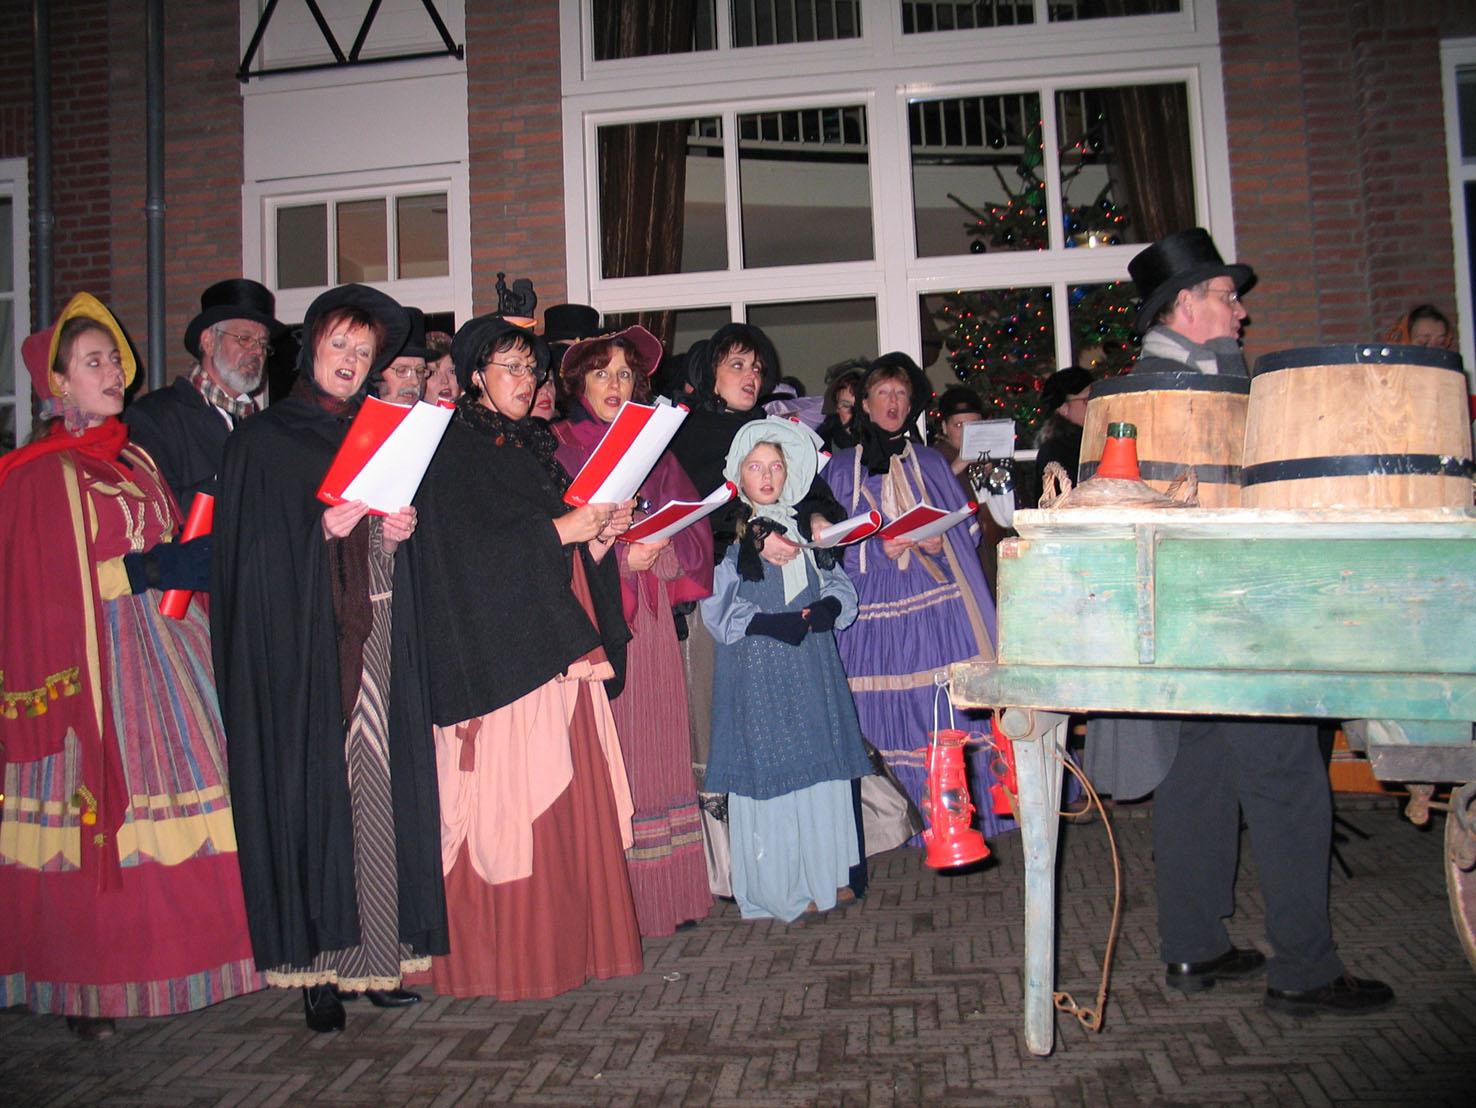 083 - Kerstmarkt Helmond 2003.jpg